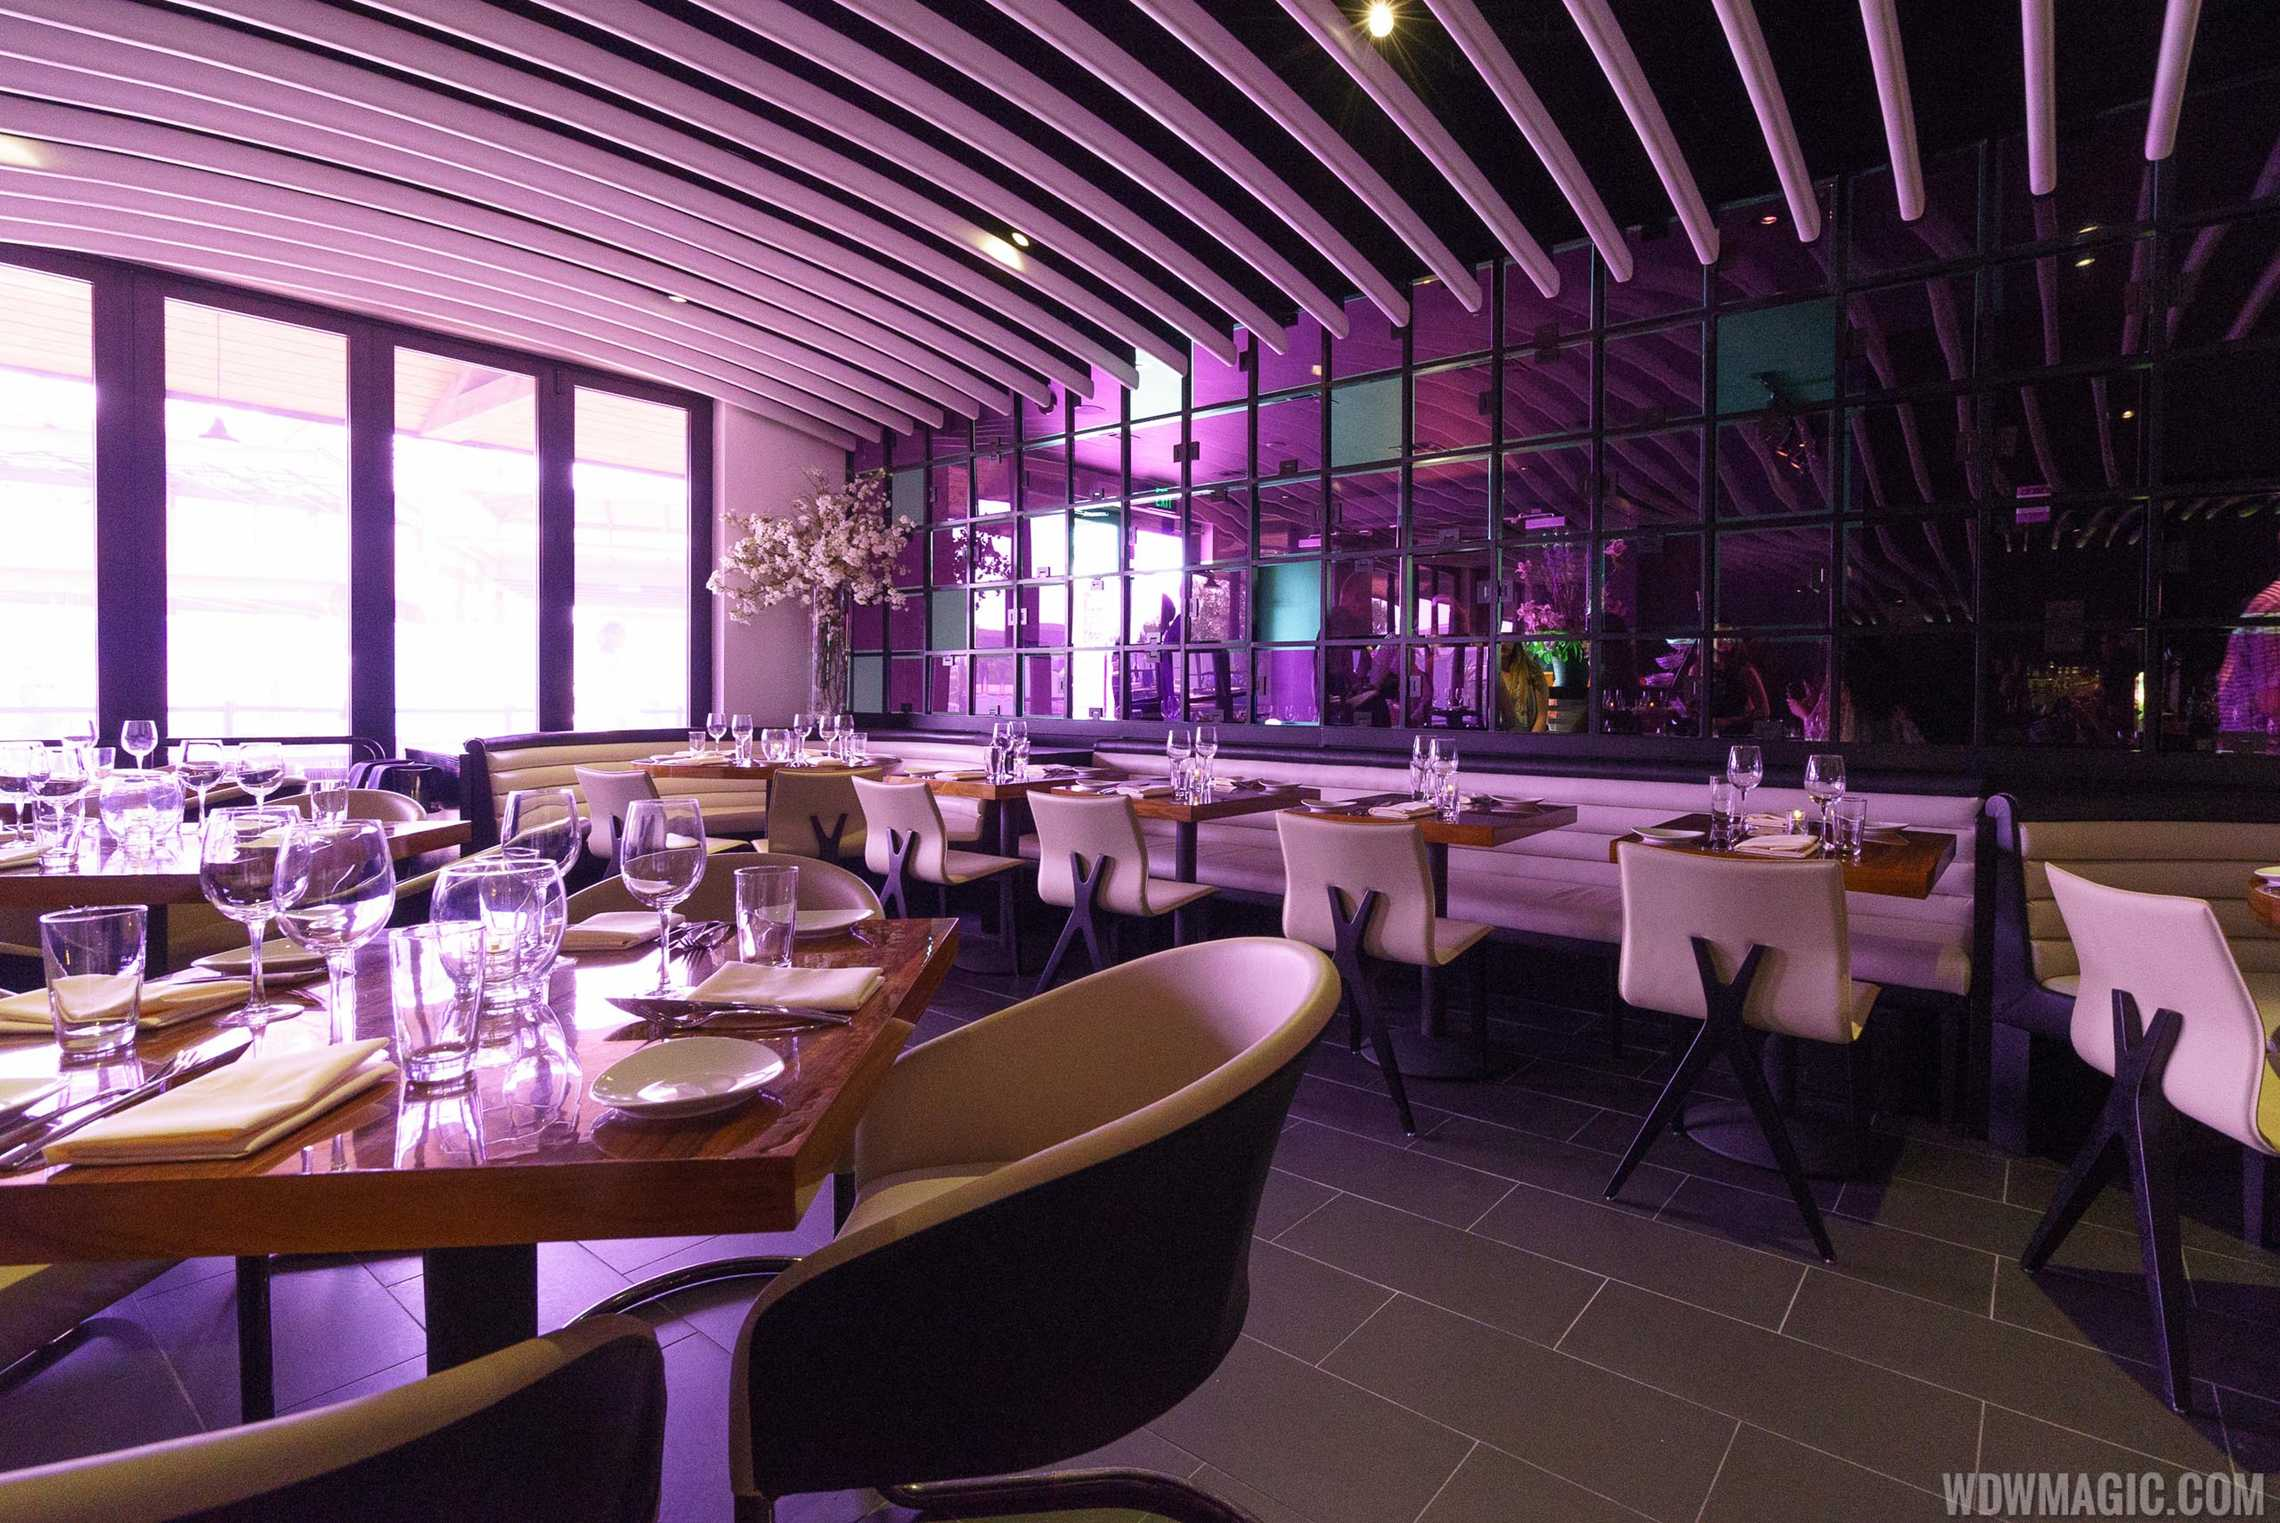 STK Orlando - Lower level dining room